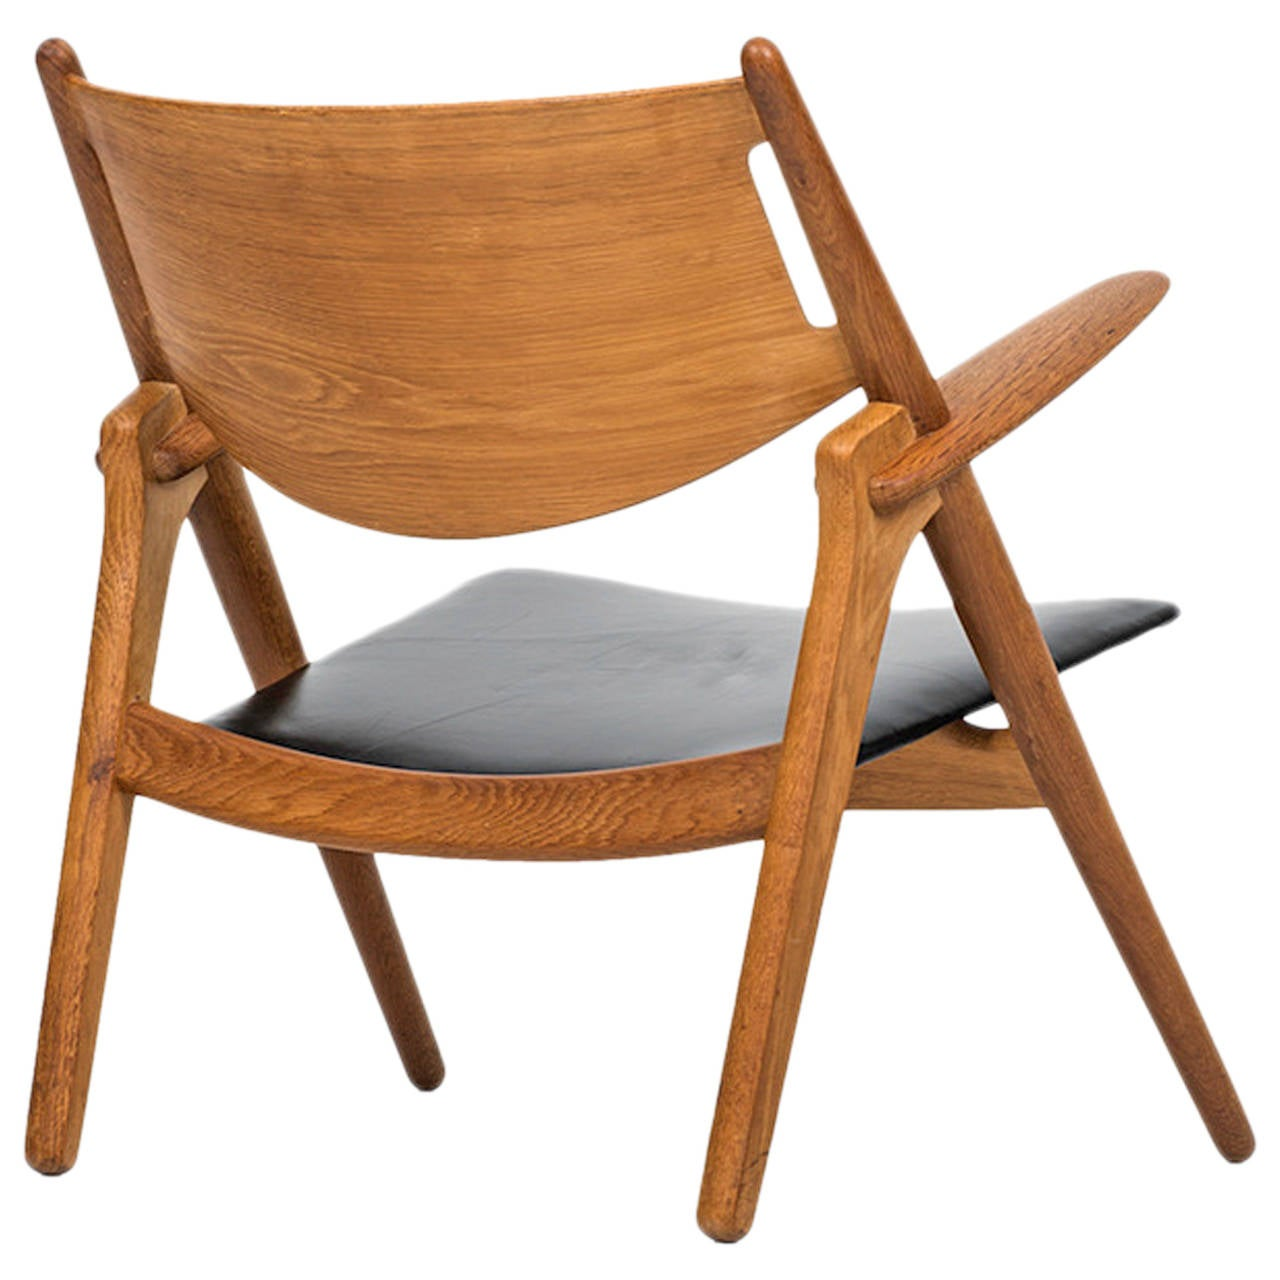 Hans Wegner Easy Chair, Model CH-28, Produced by Carl Hansen & Søn in Denmark